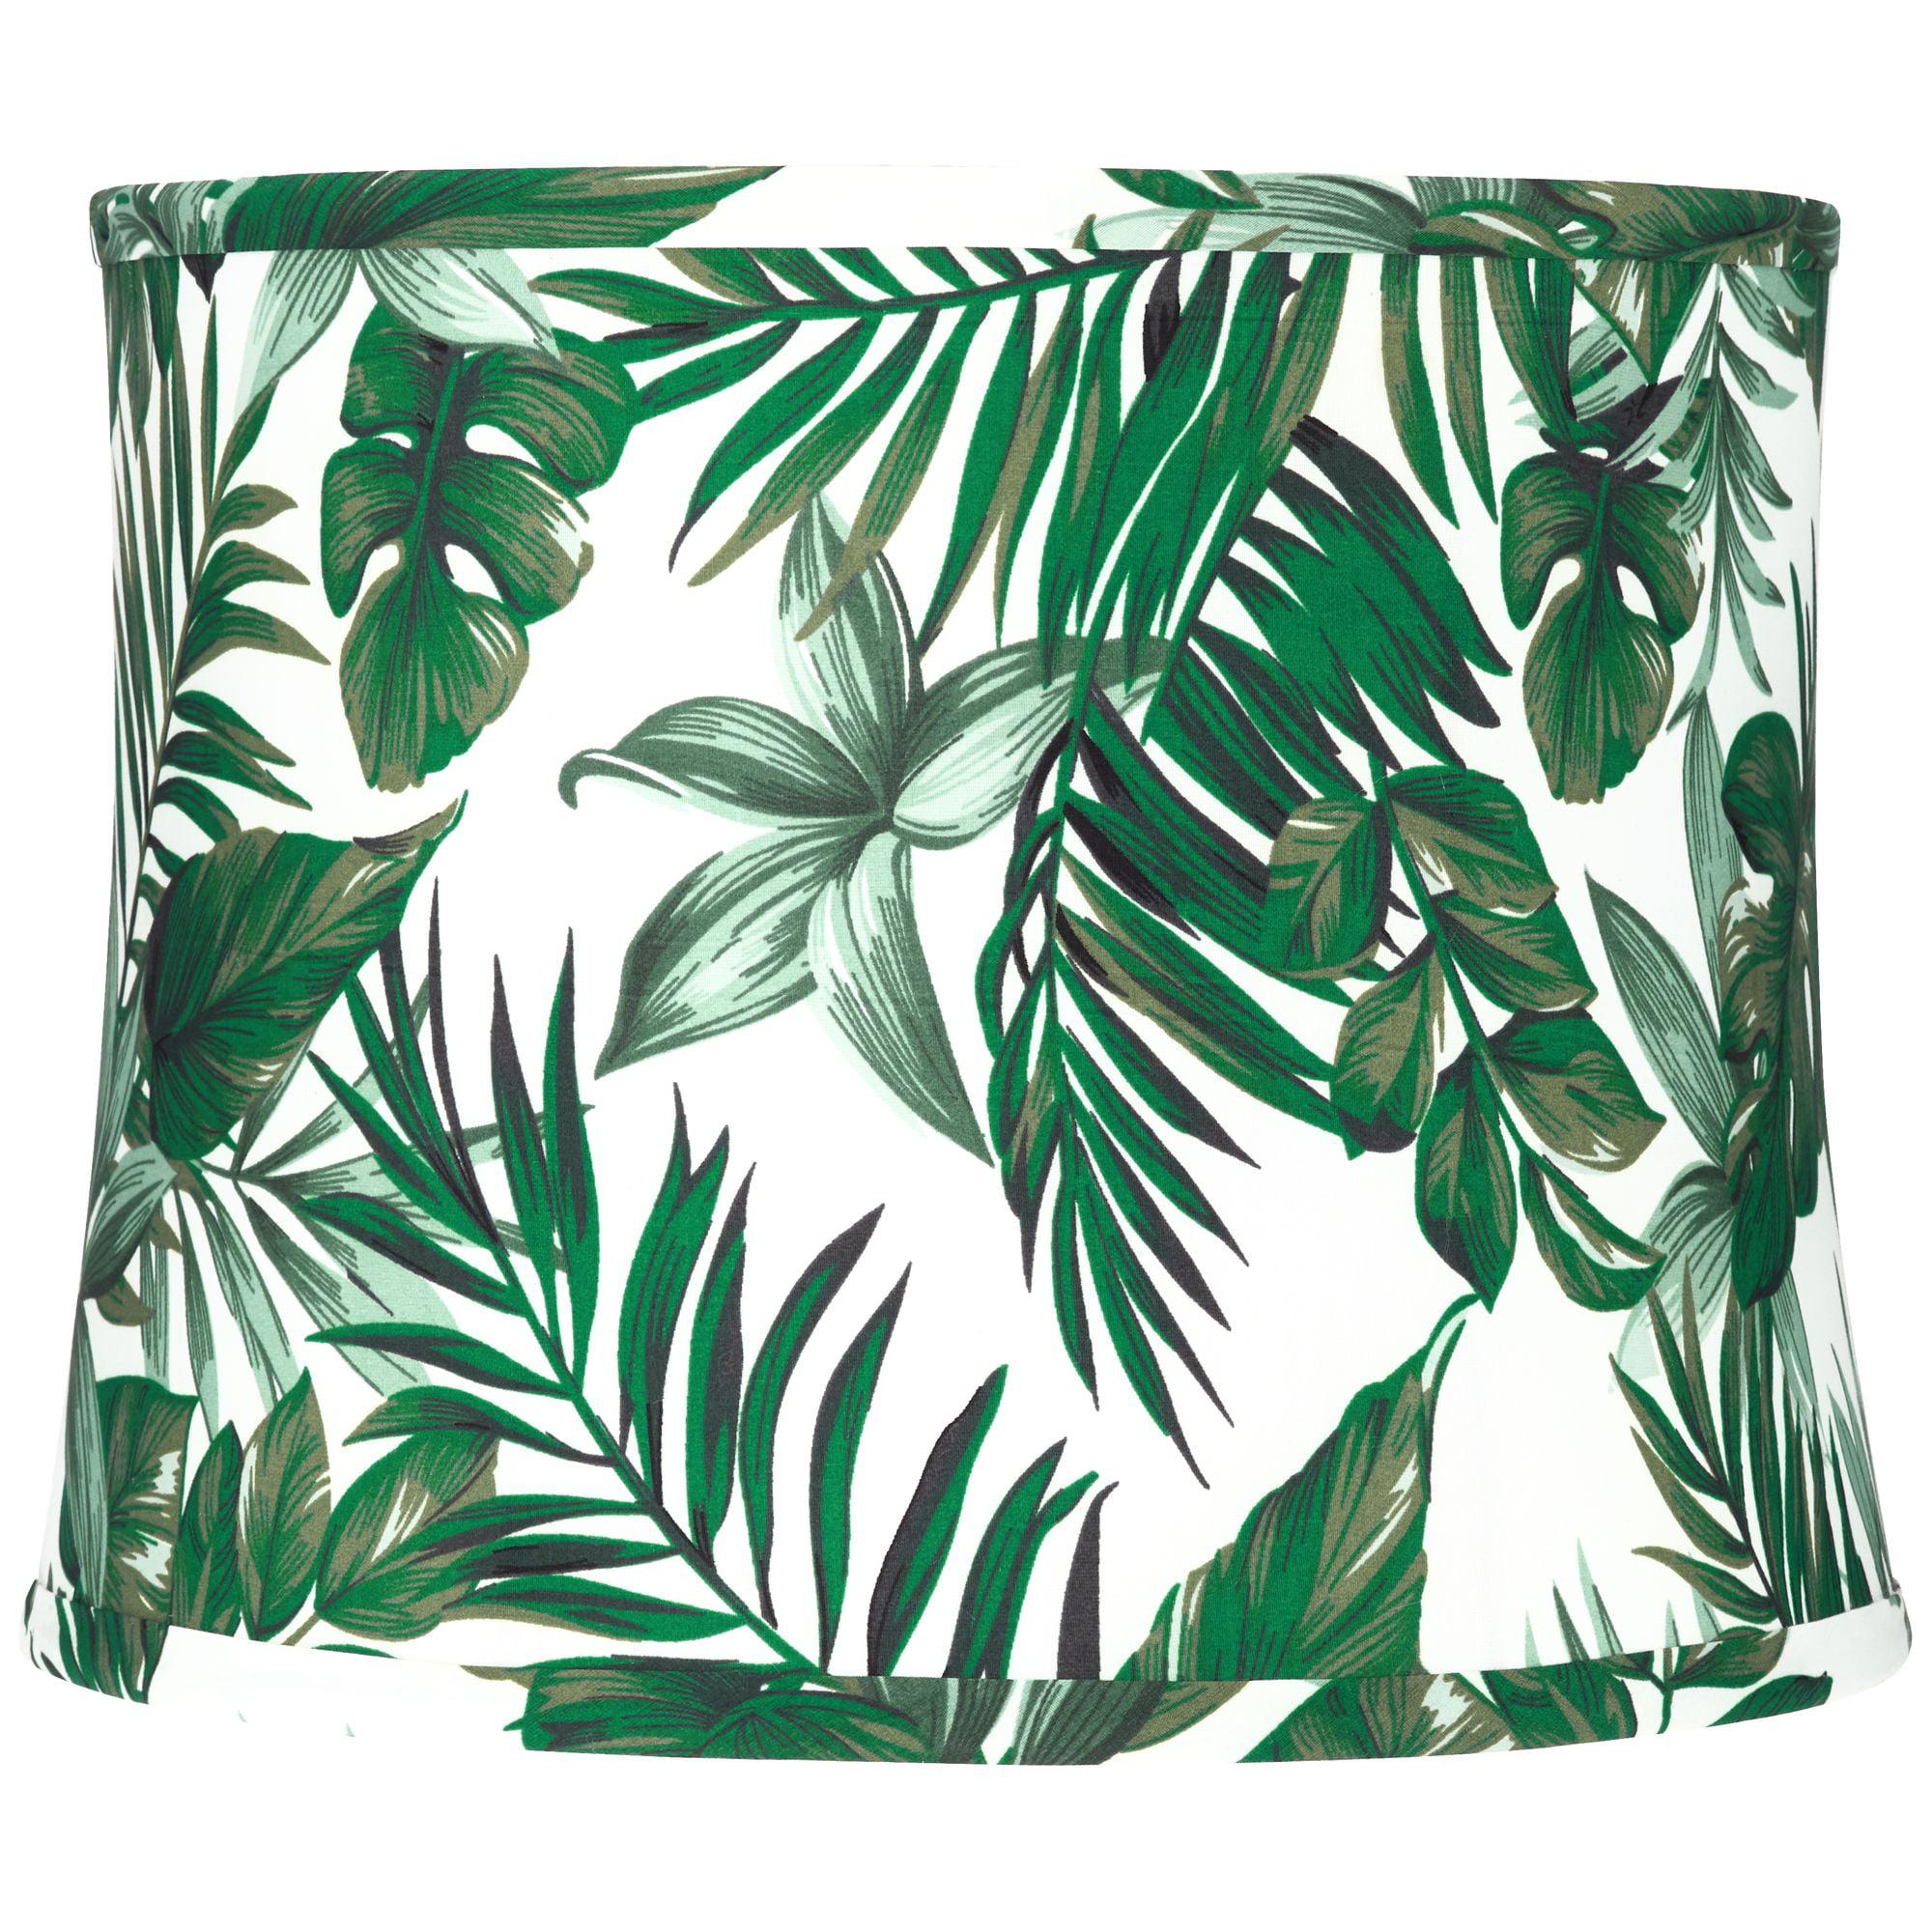 Springcrest Manaus Green Tropical Drum Lamp Shade 12x13x10 (Spider)